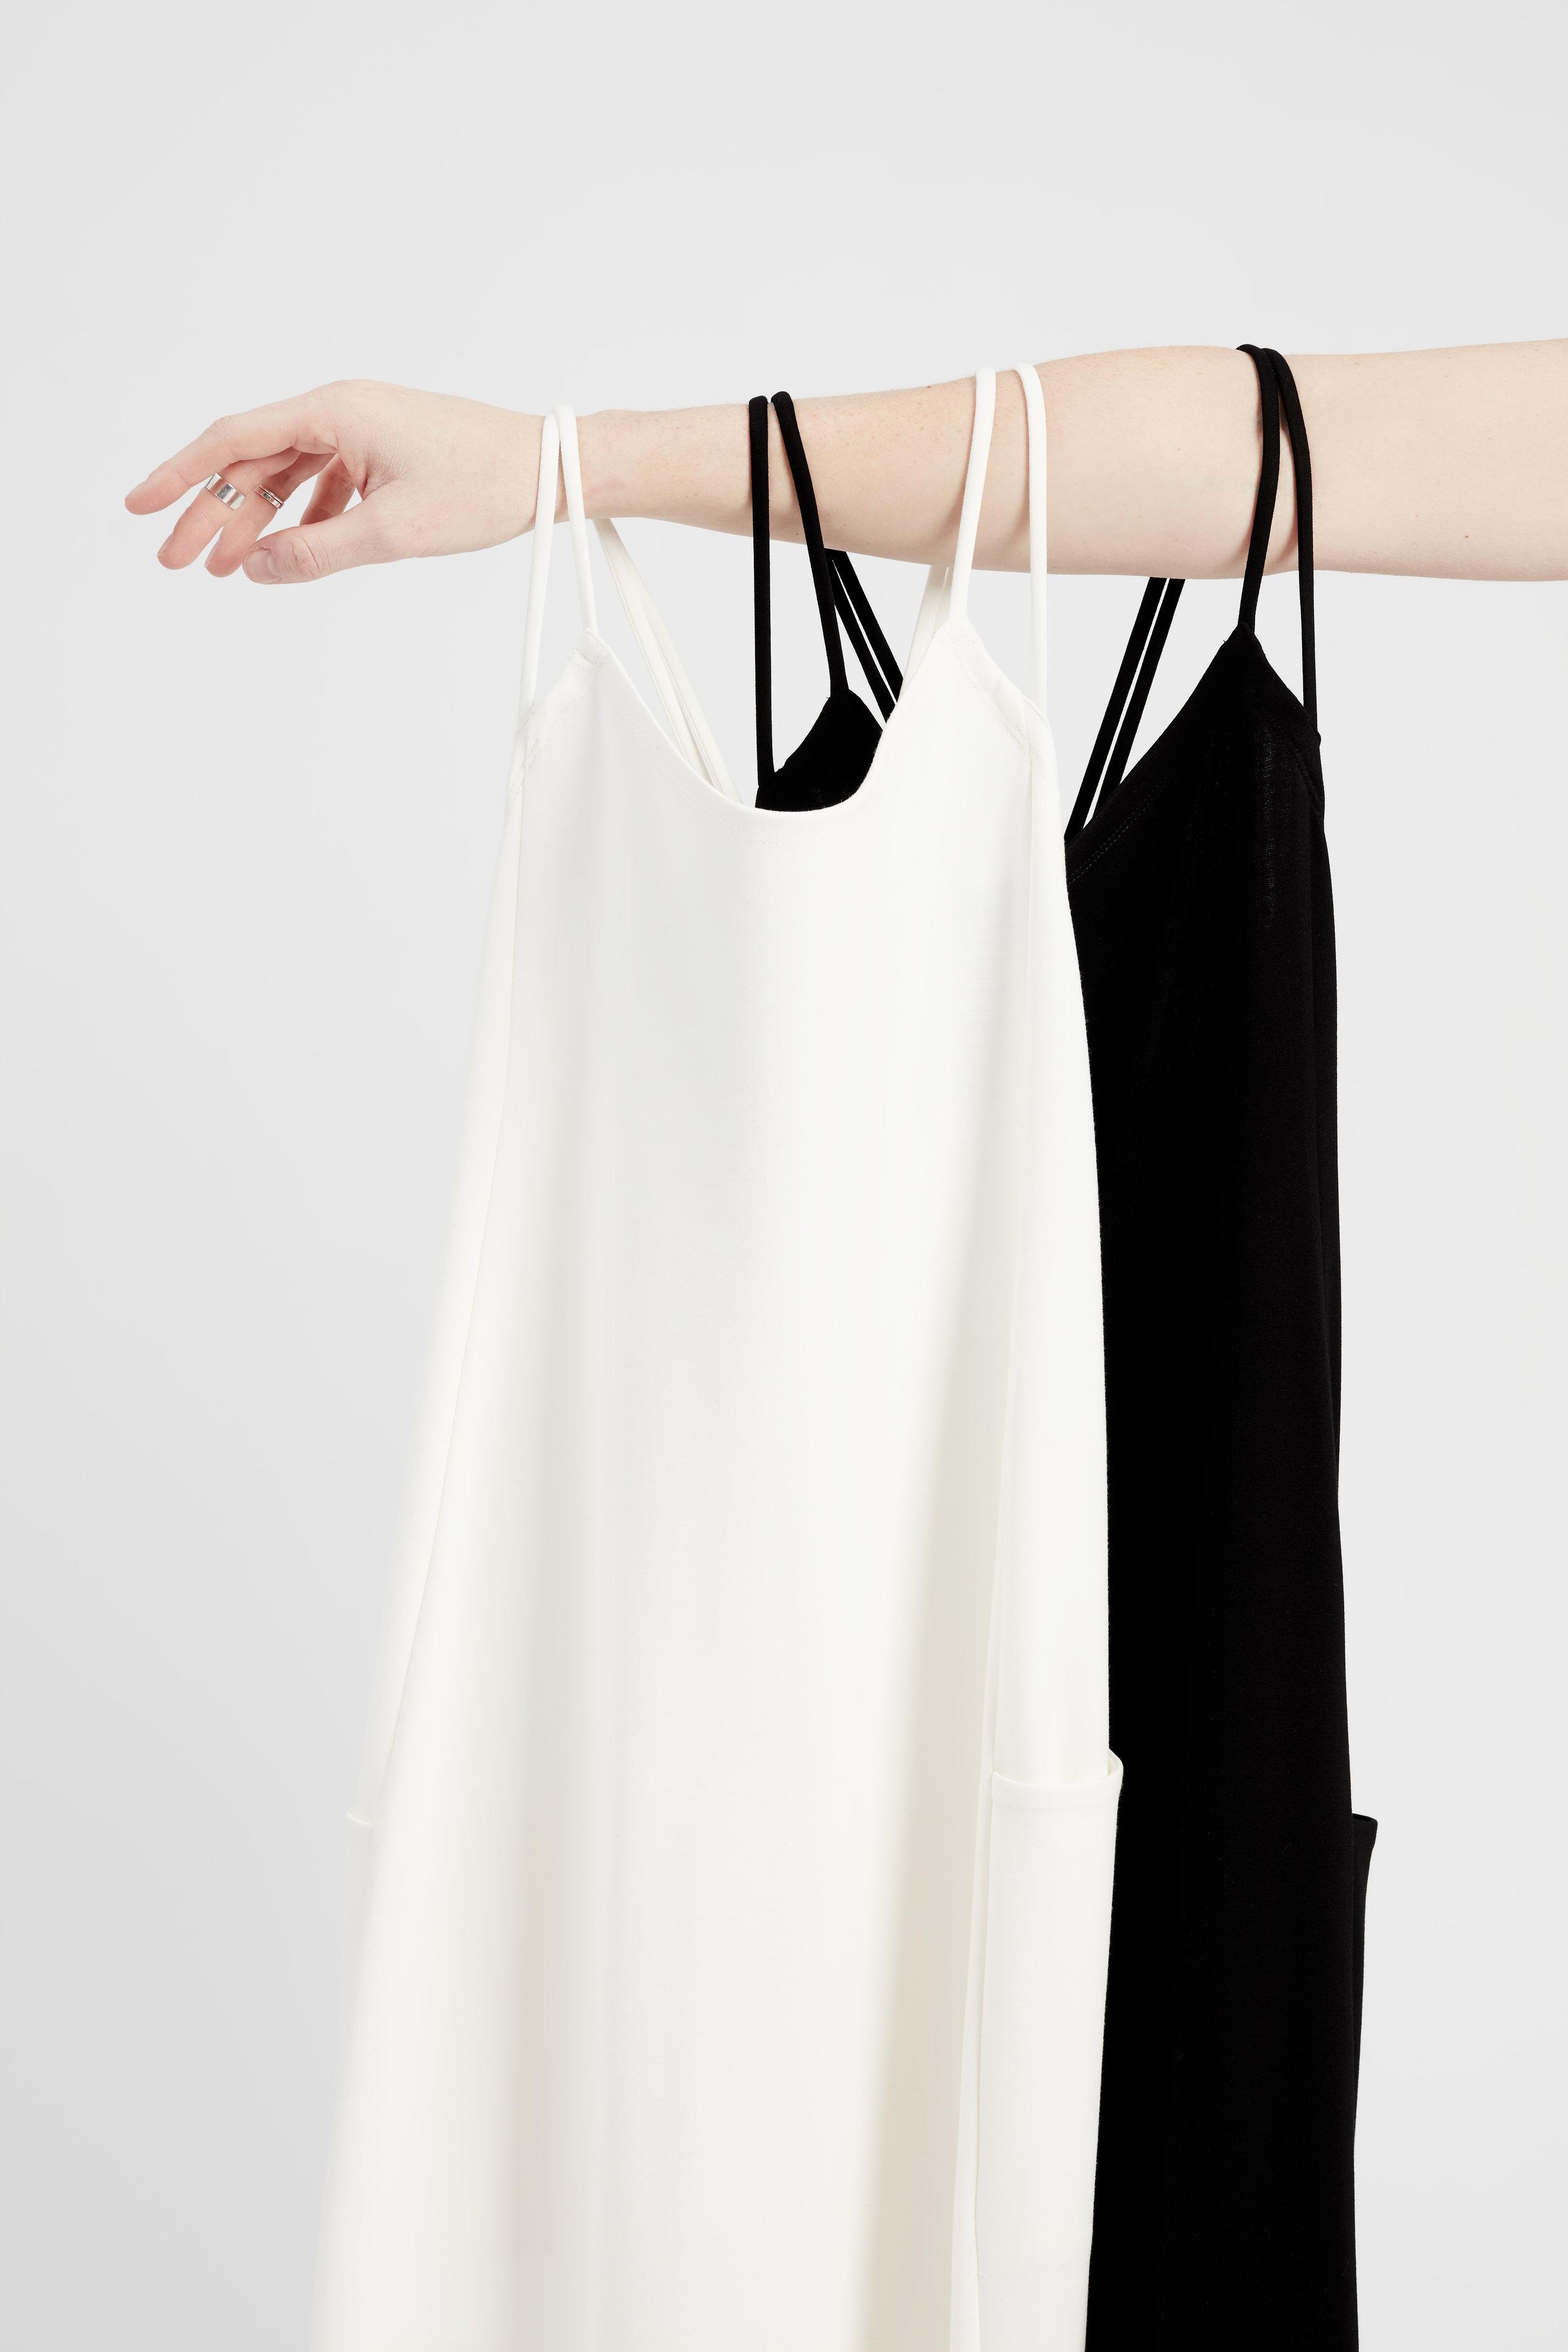 elisa-c-rossow/strap/dress/h3